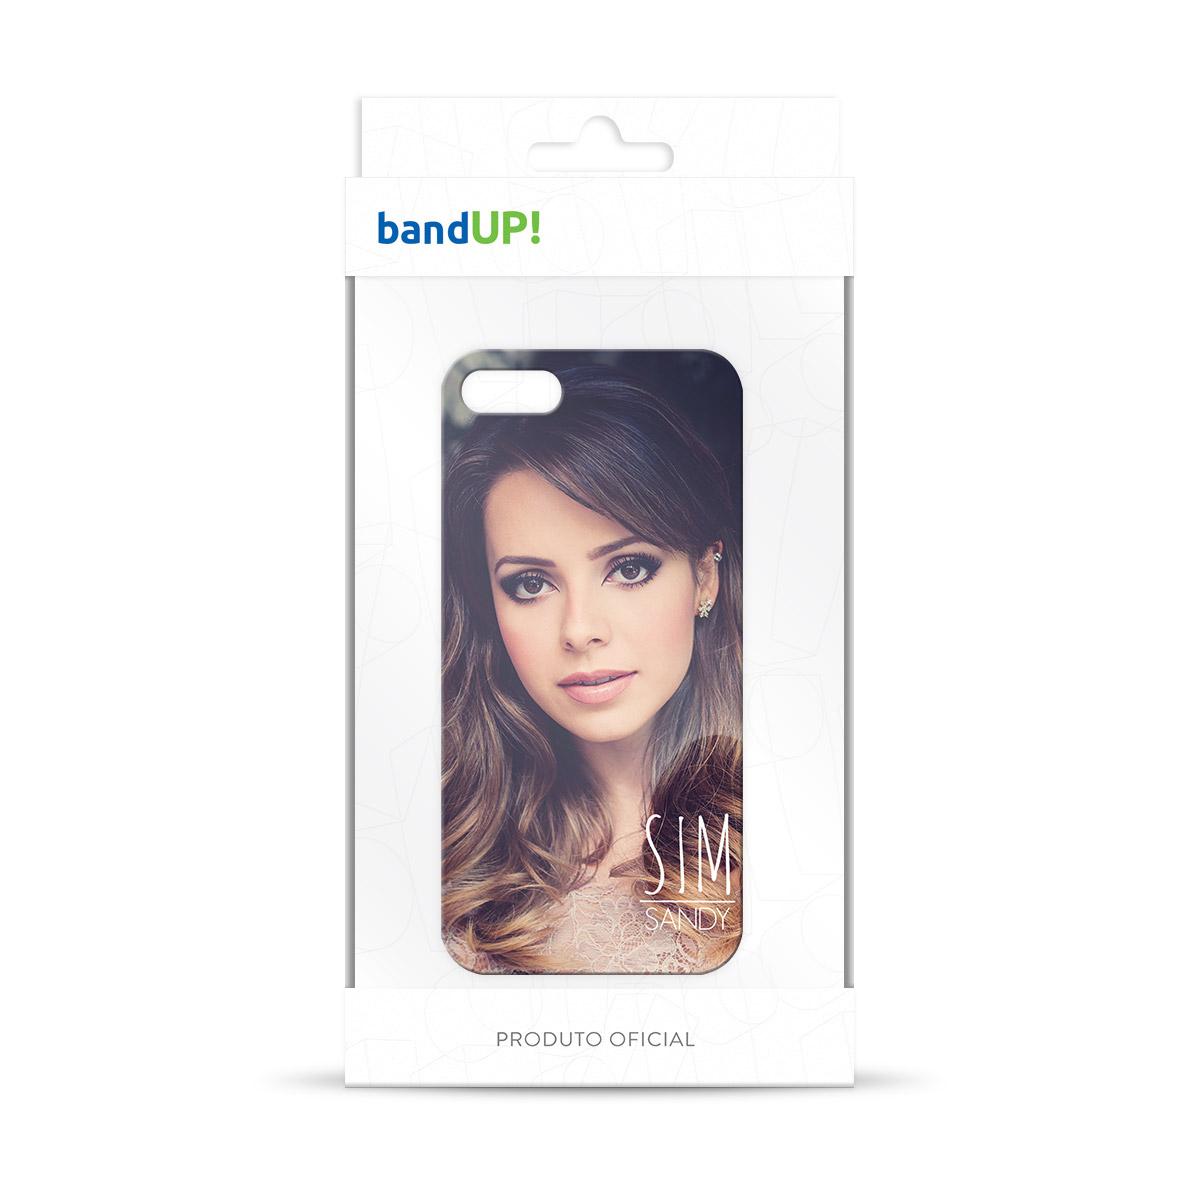 Capa de iPhone 5/5S Sandy Sim Modelo 2